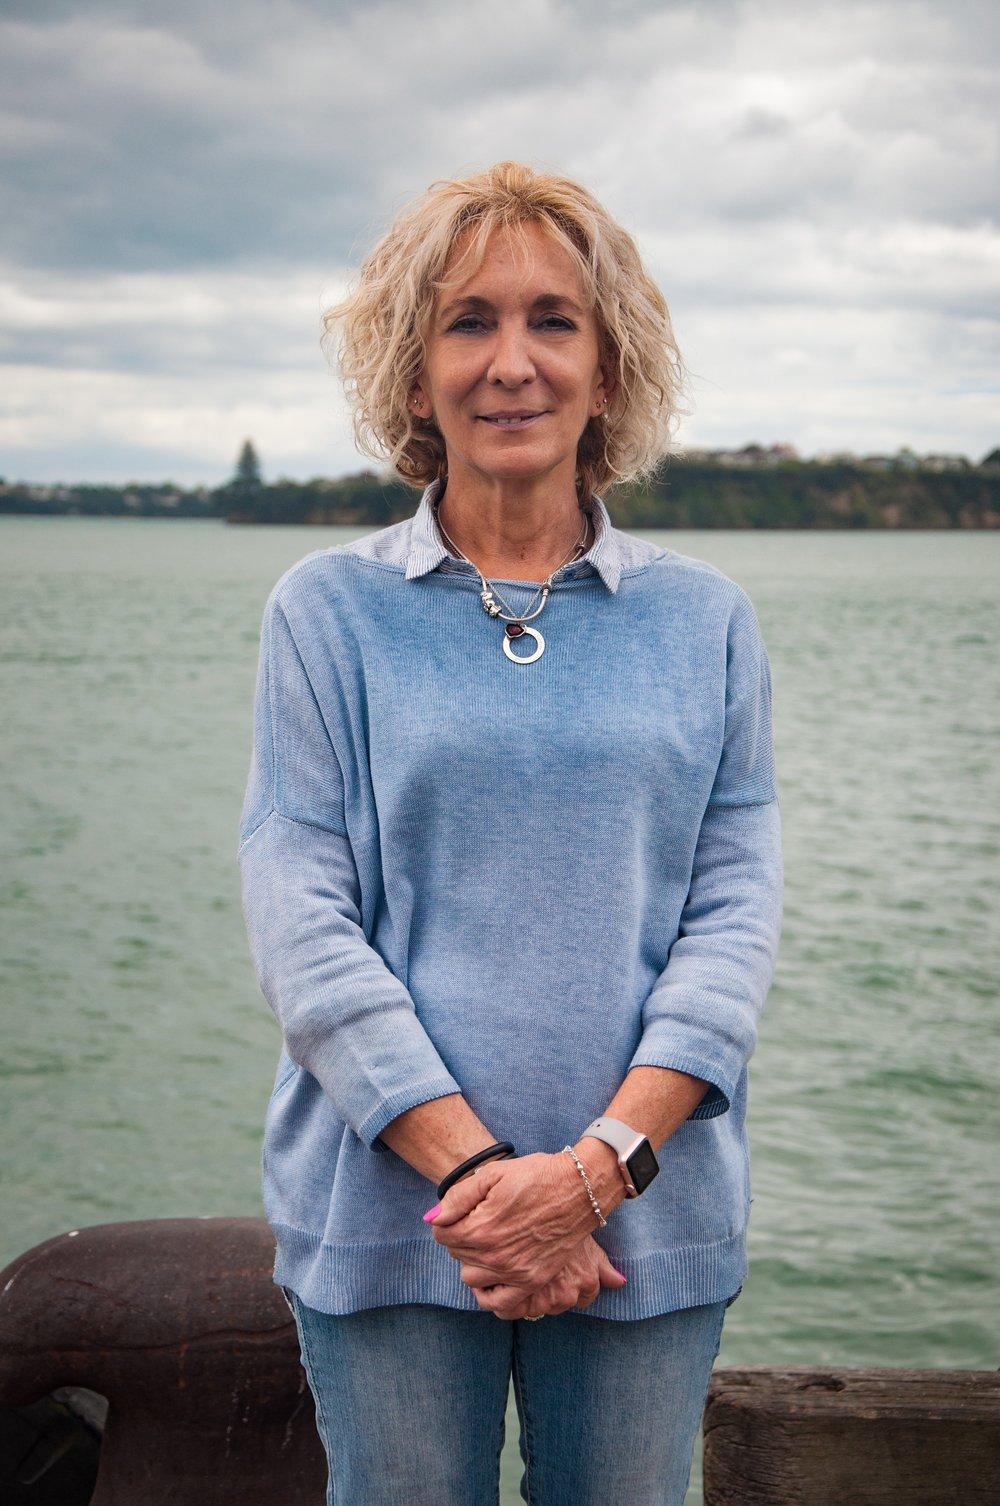 Martine STRACHAN - Education Specialist martine@nzservices.co.nz